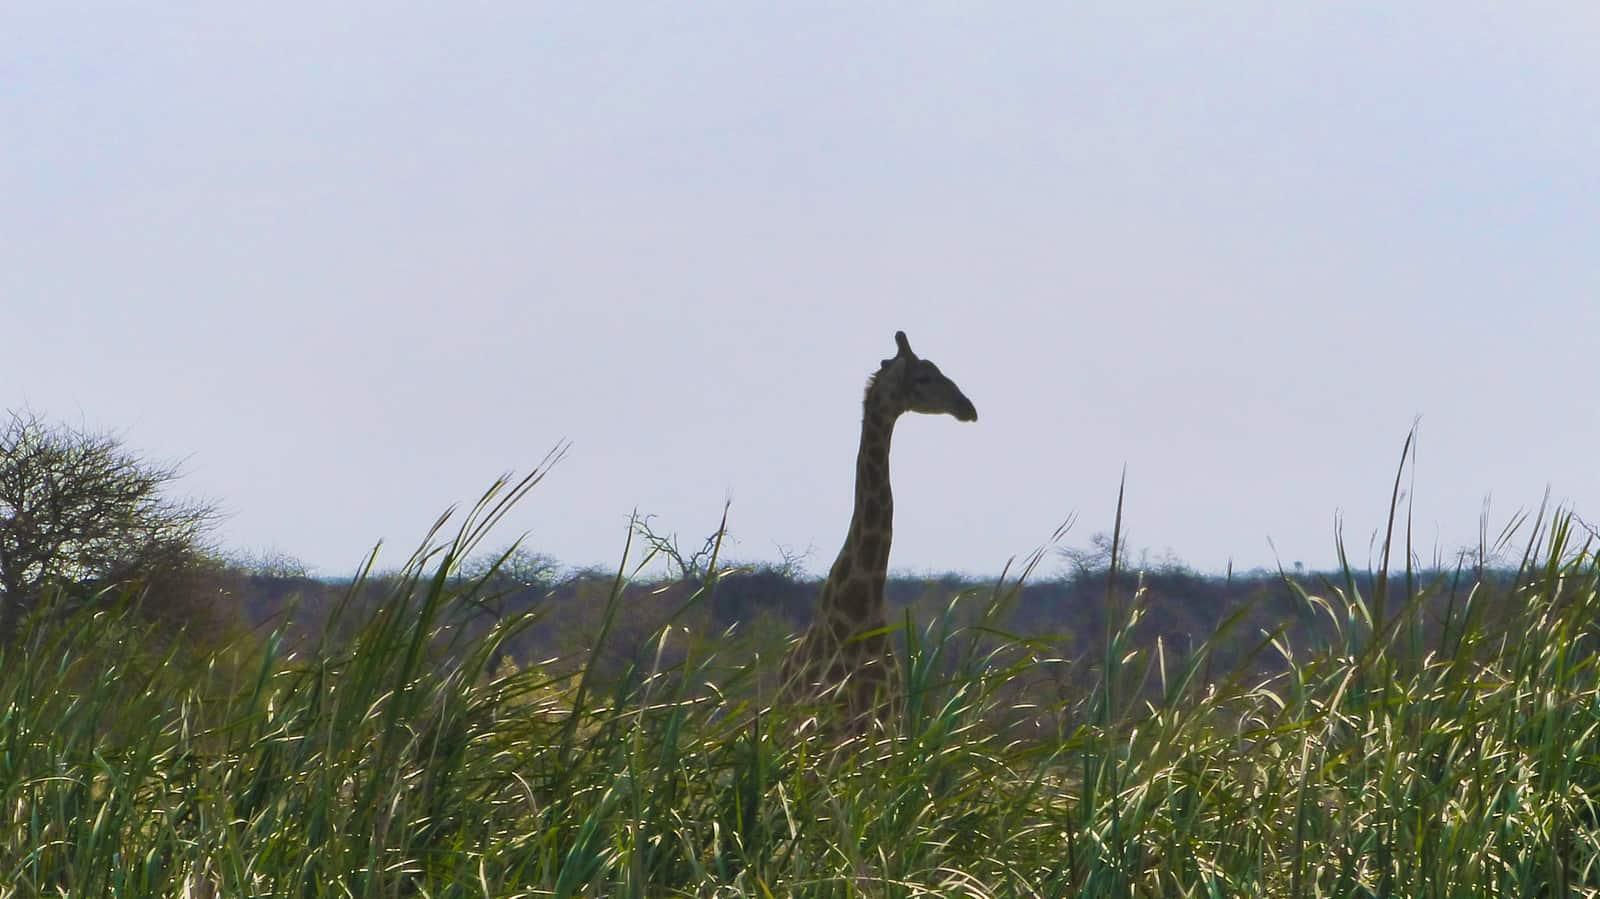 Giraffe at Etosha, Namibia